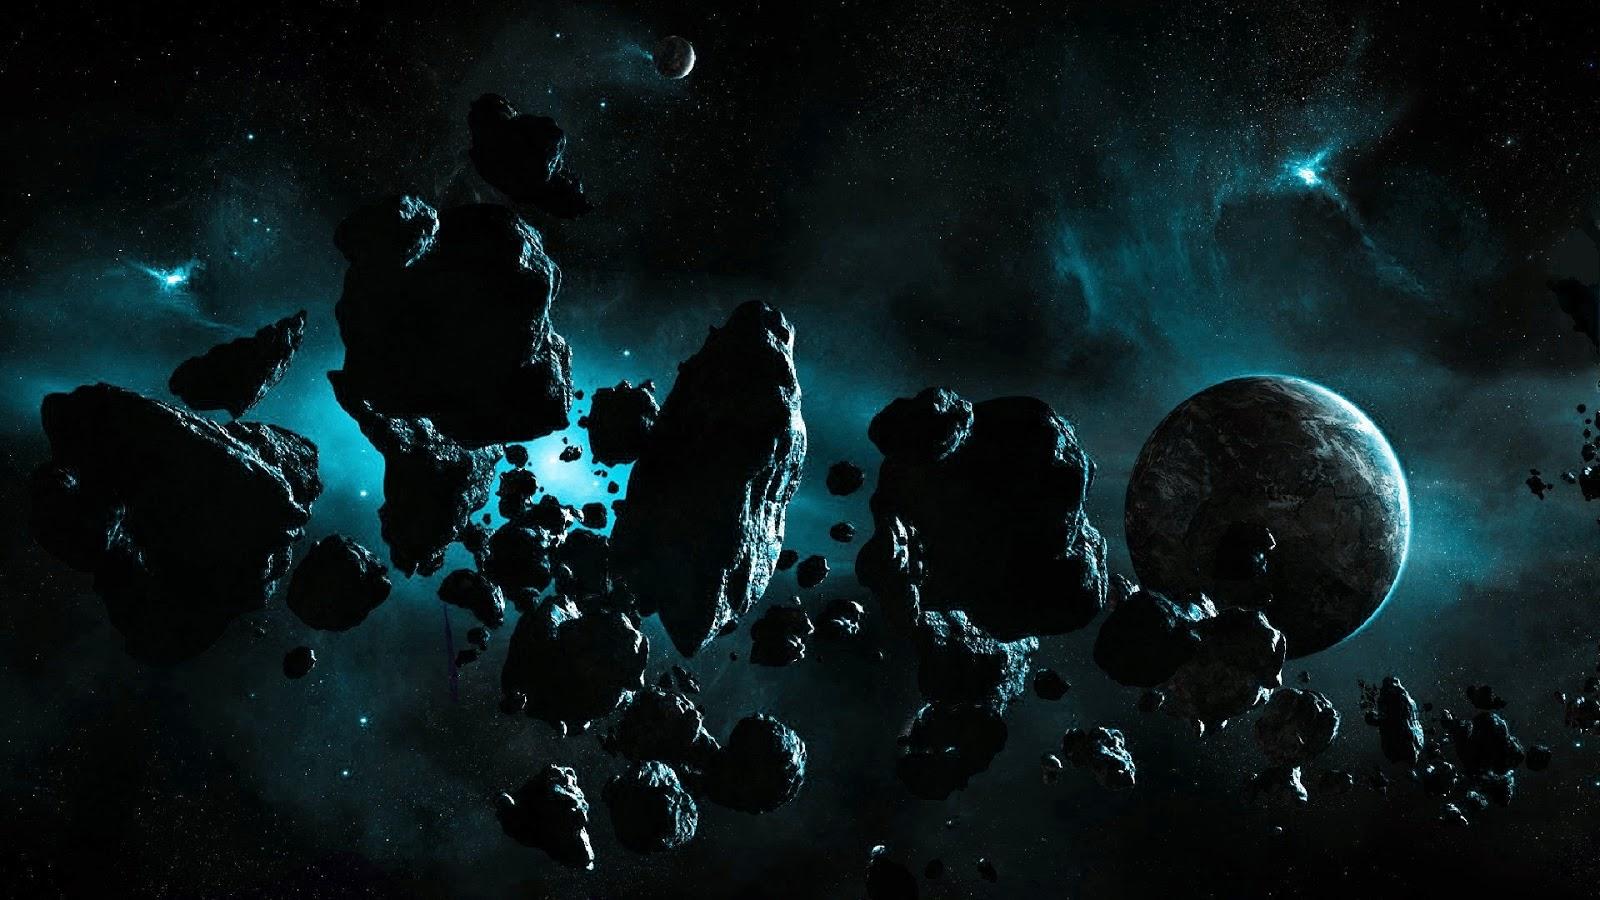 Fondo de pantalla abstracto espacio oscuro imagenes for Espacio exterior 4k